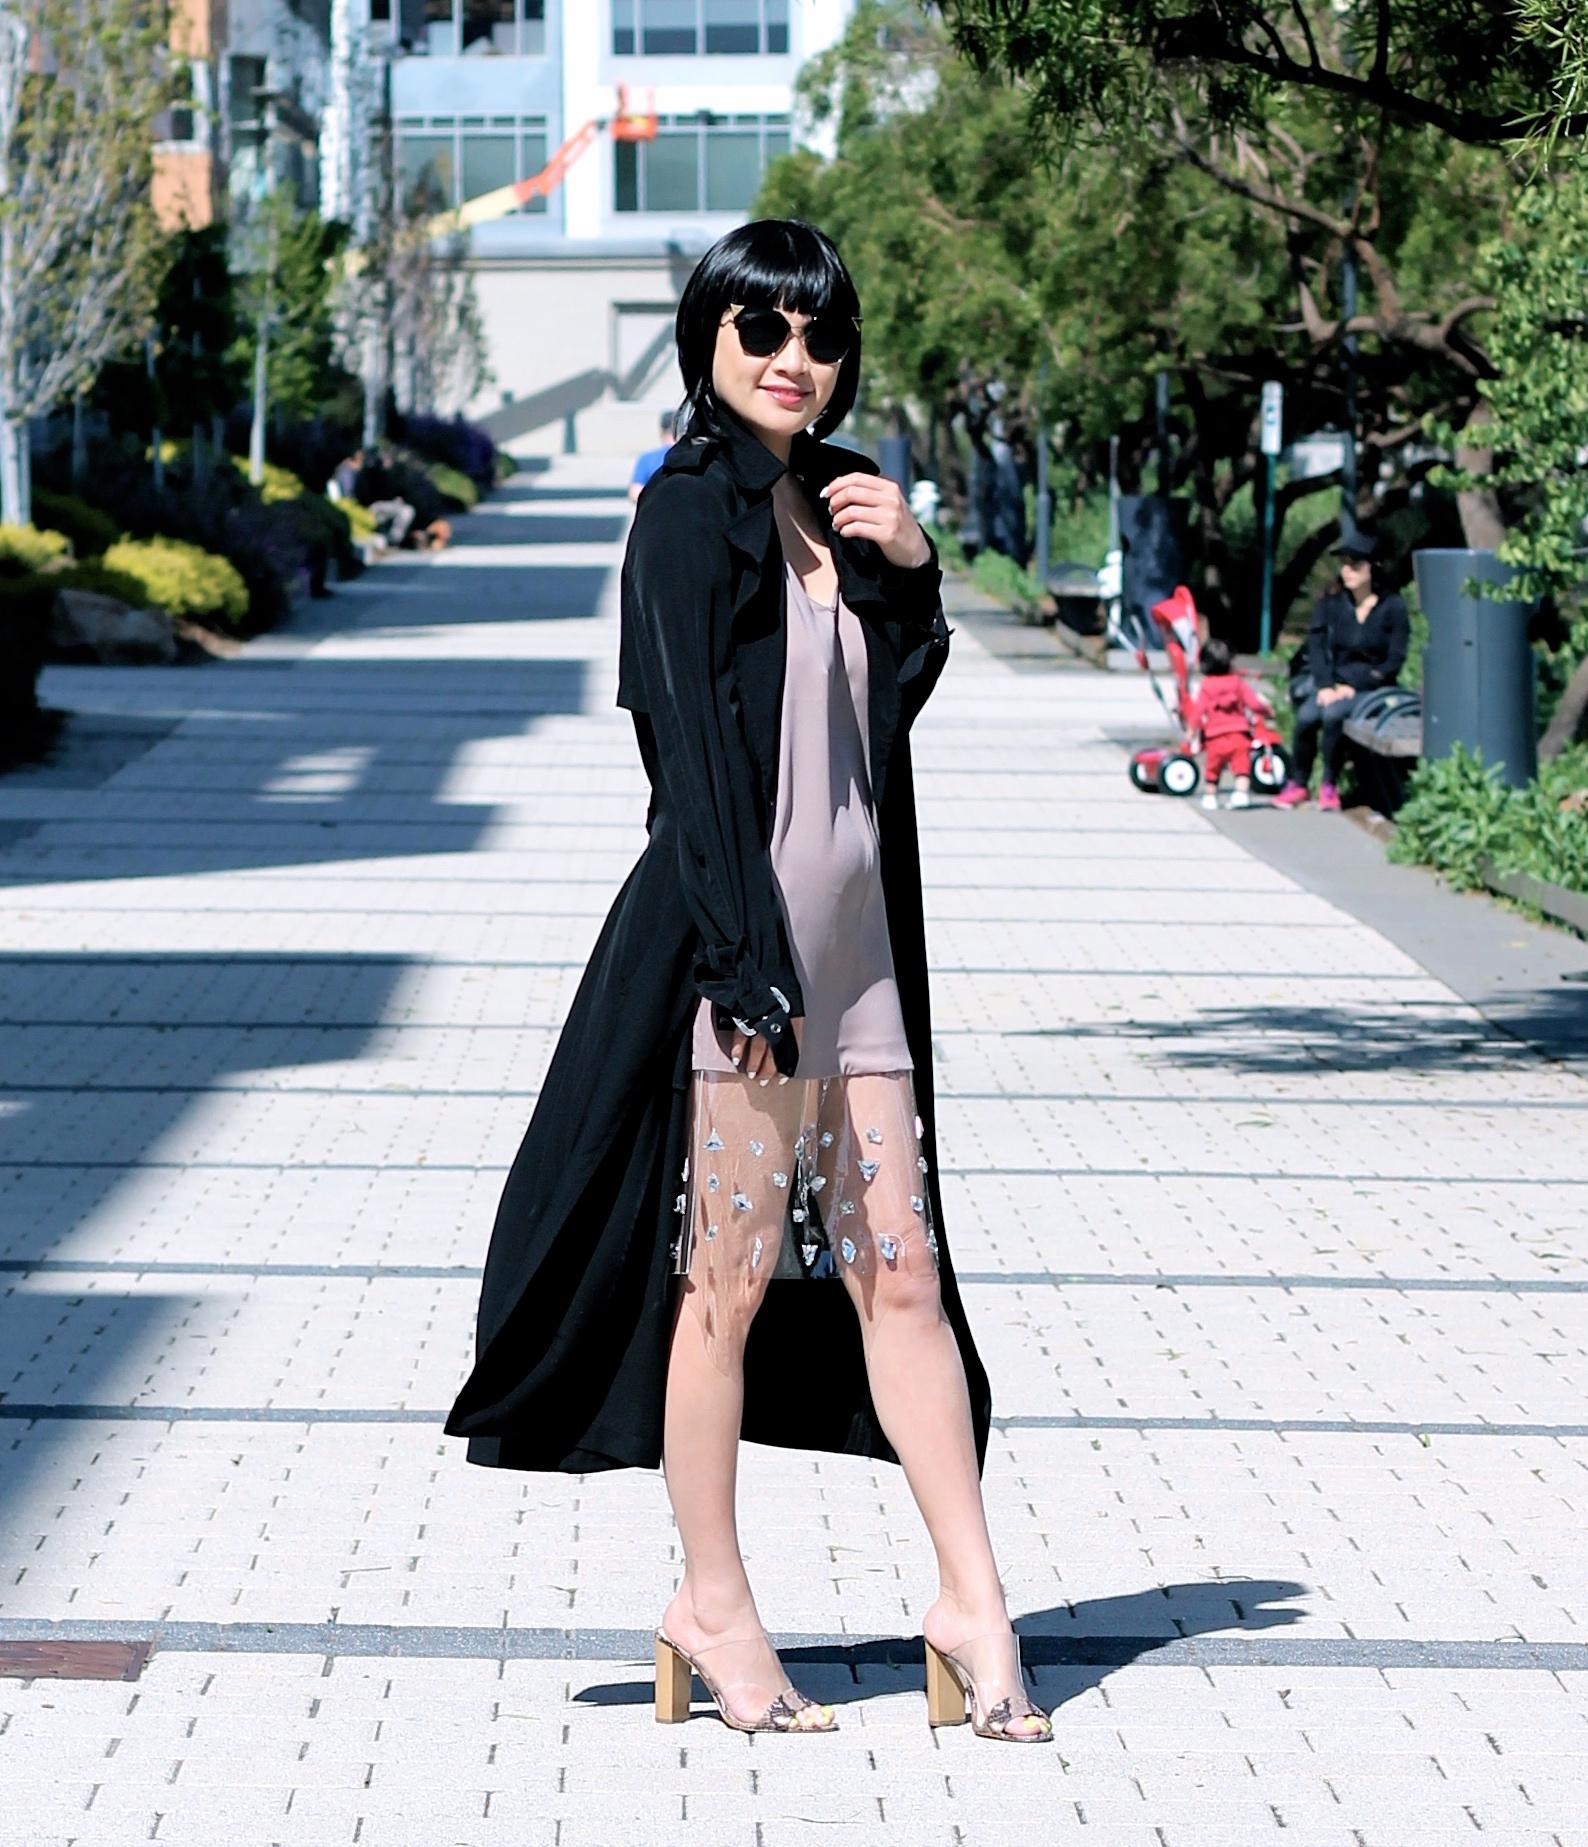 Marciano dress, Zara jacket, Fendi sunglasses, Guess shoes